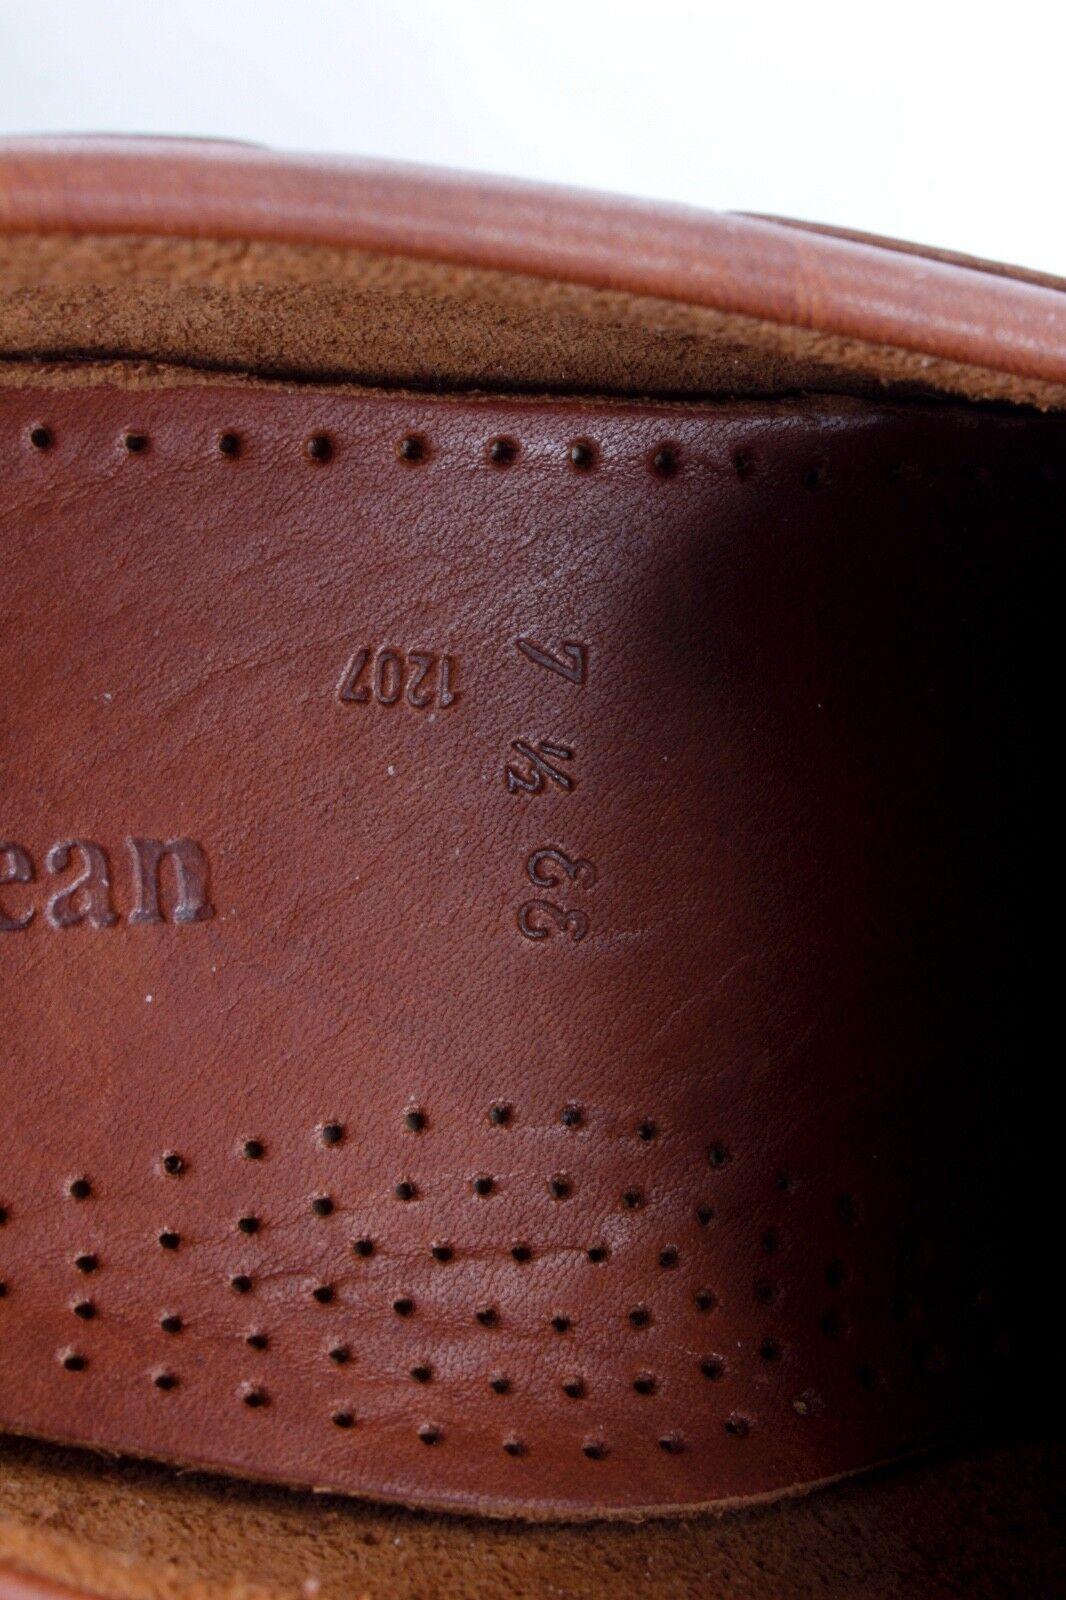 L.L. BEAN Handsewn Braun 7 Leder Kiltie Tassel Moccasin Loafer 7 Braun D 374c09